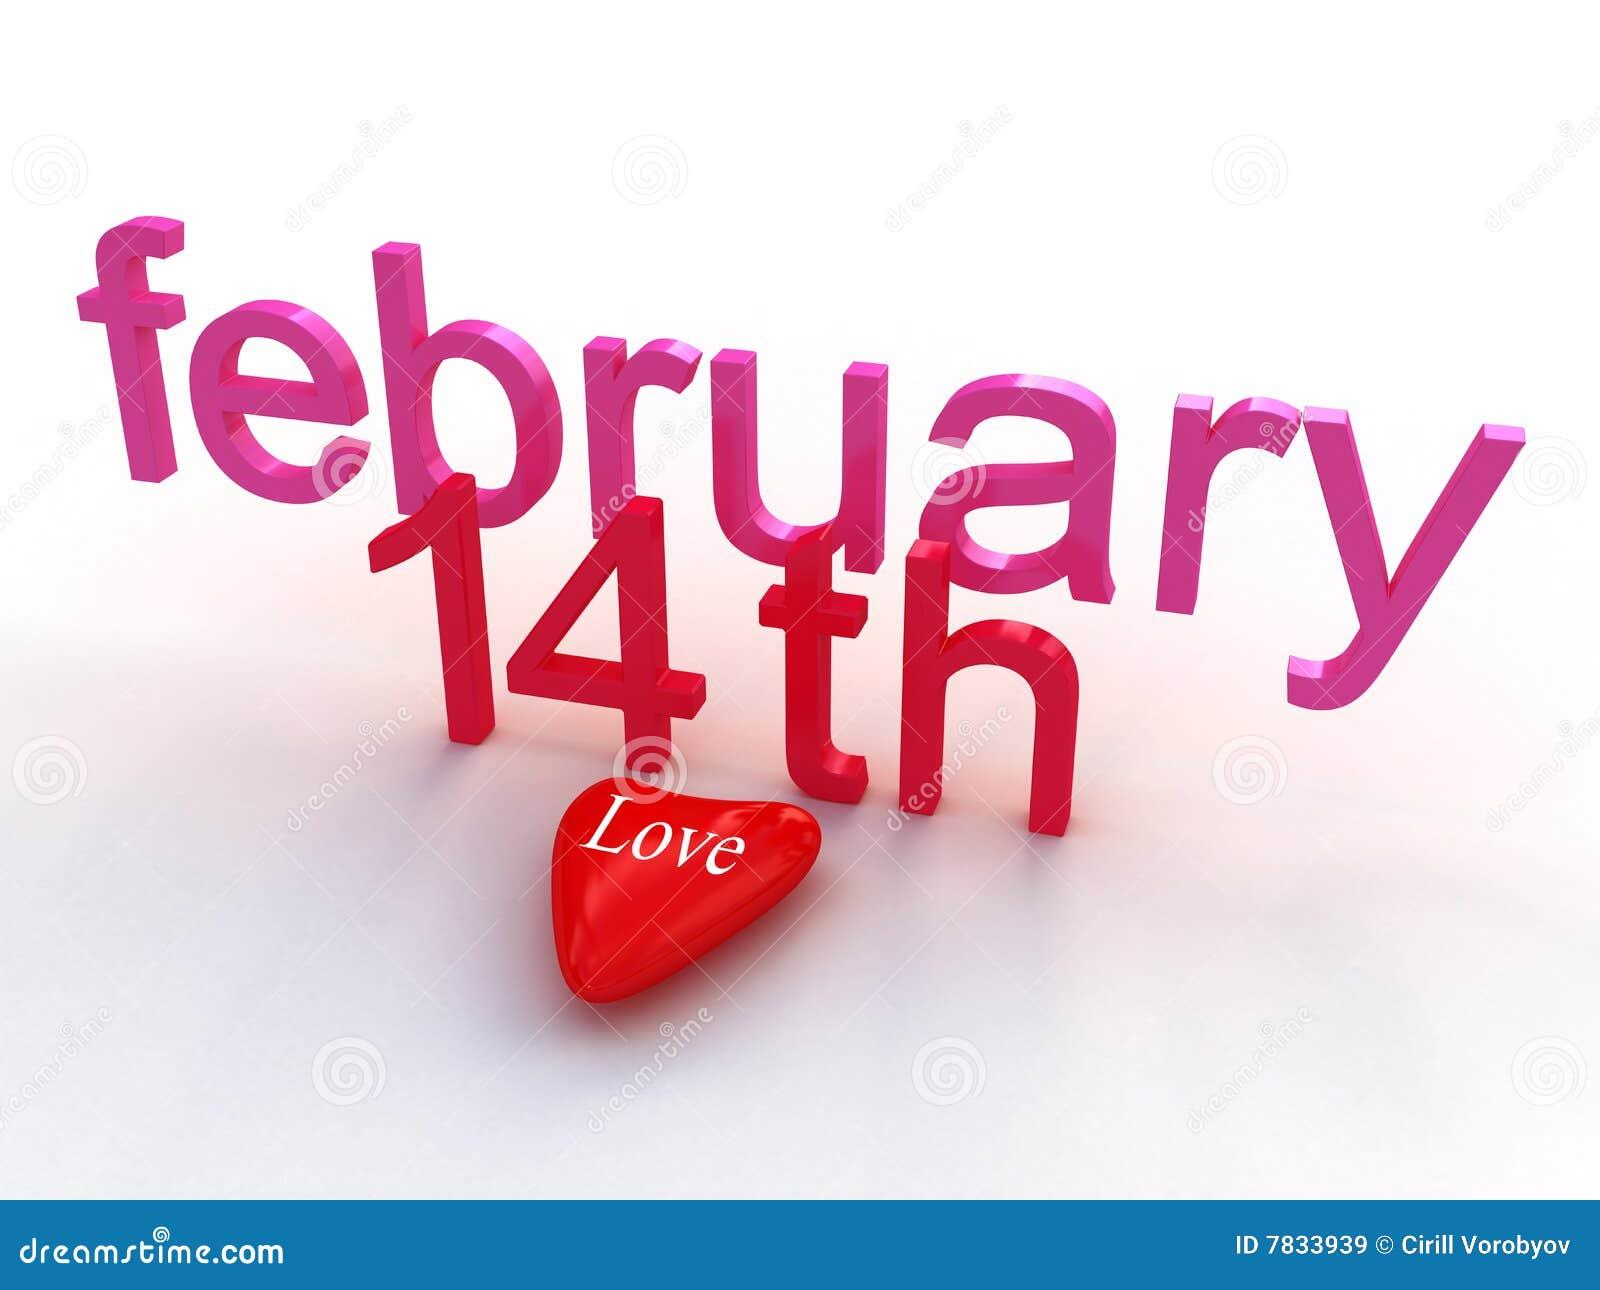 Feb 14th Valentines Day